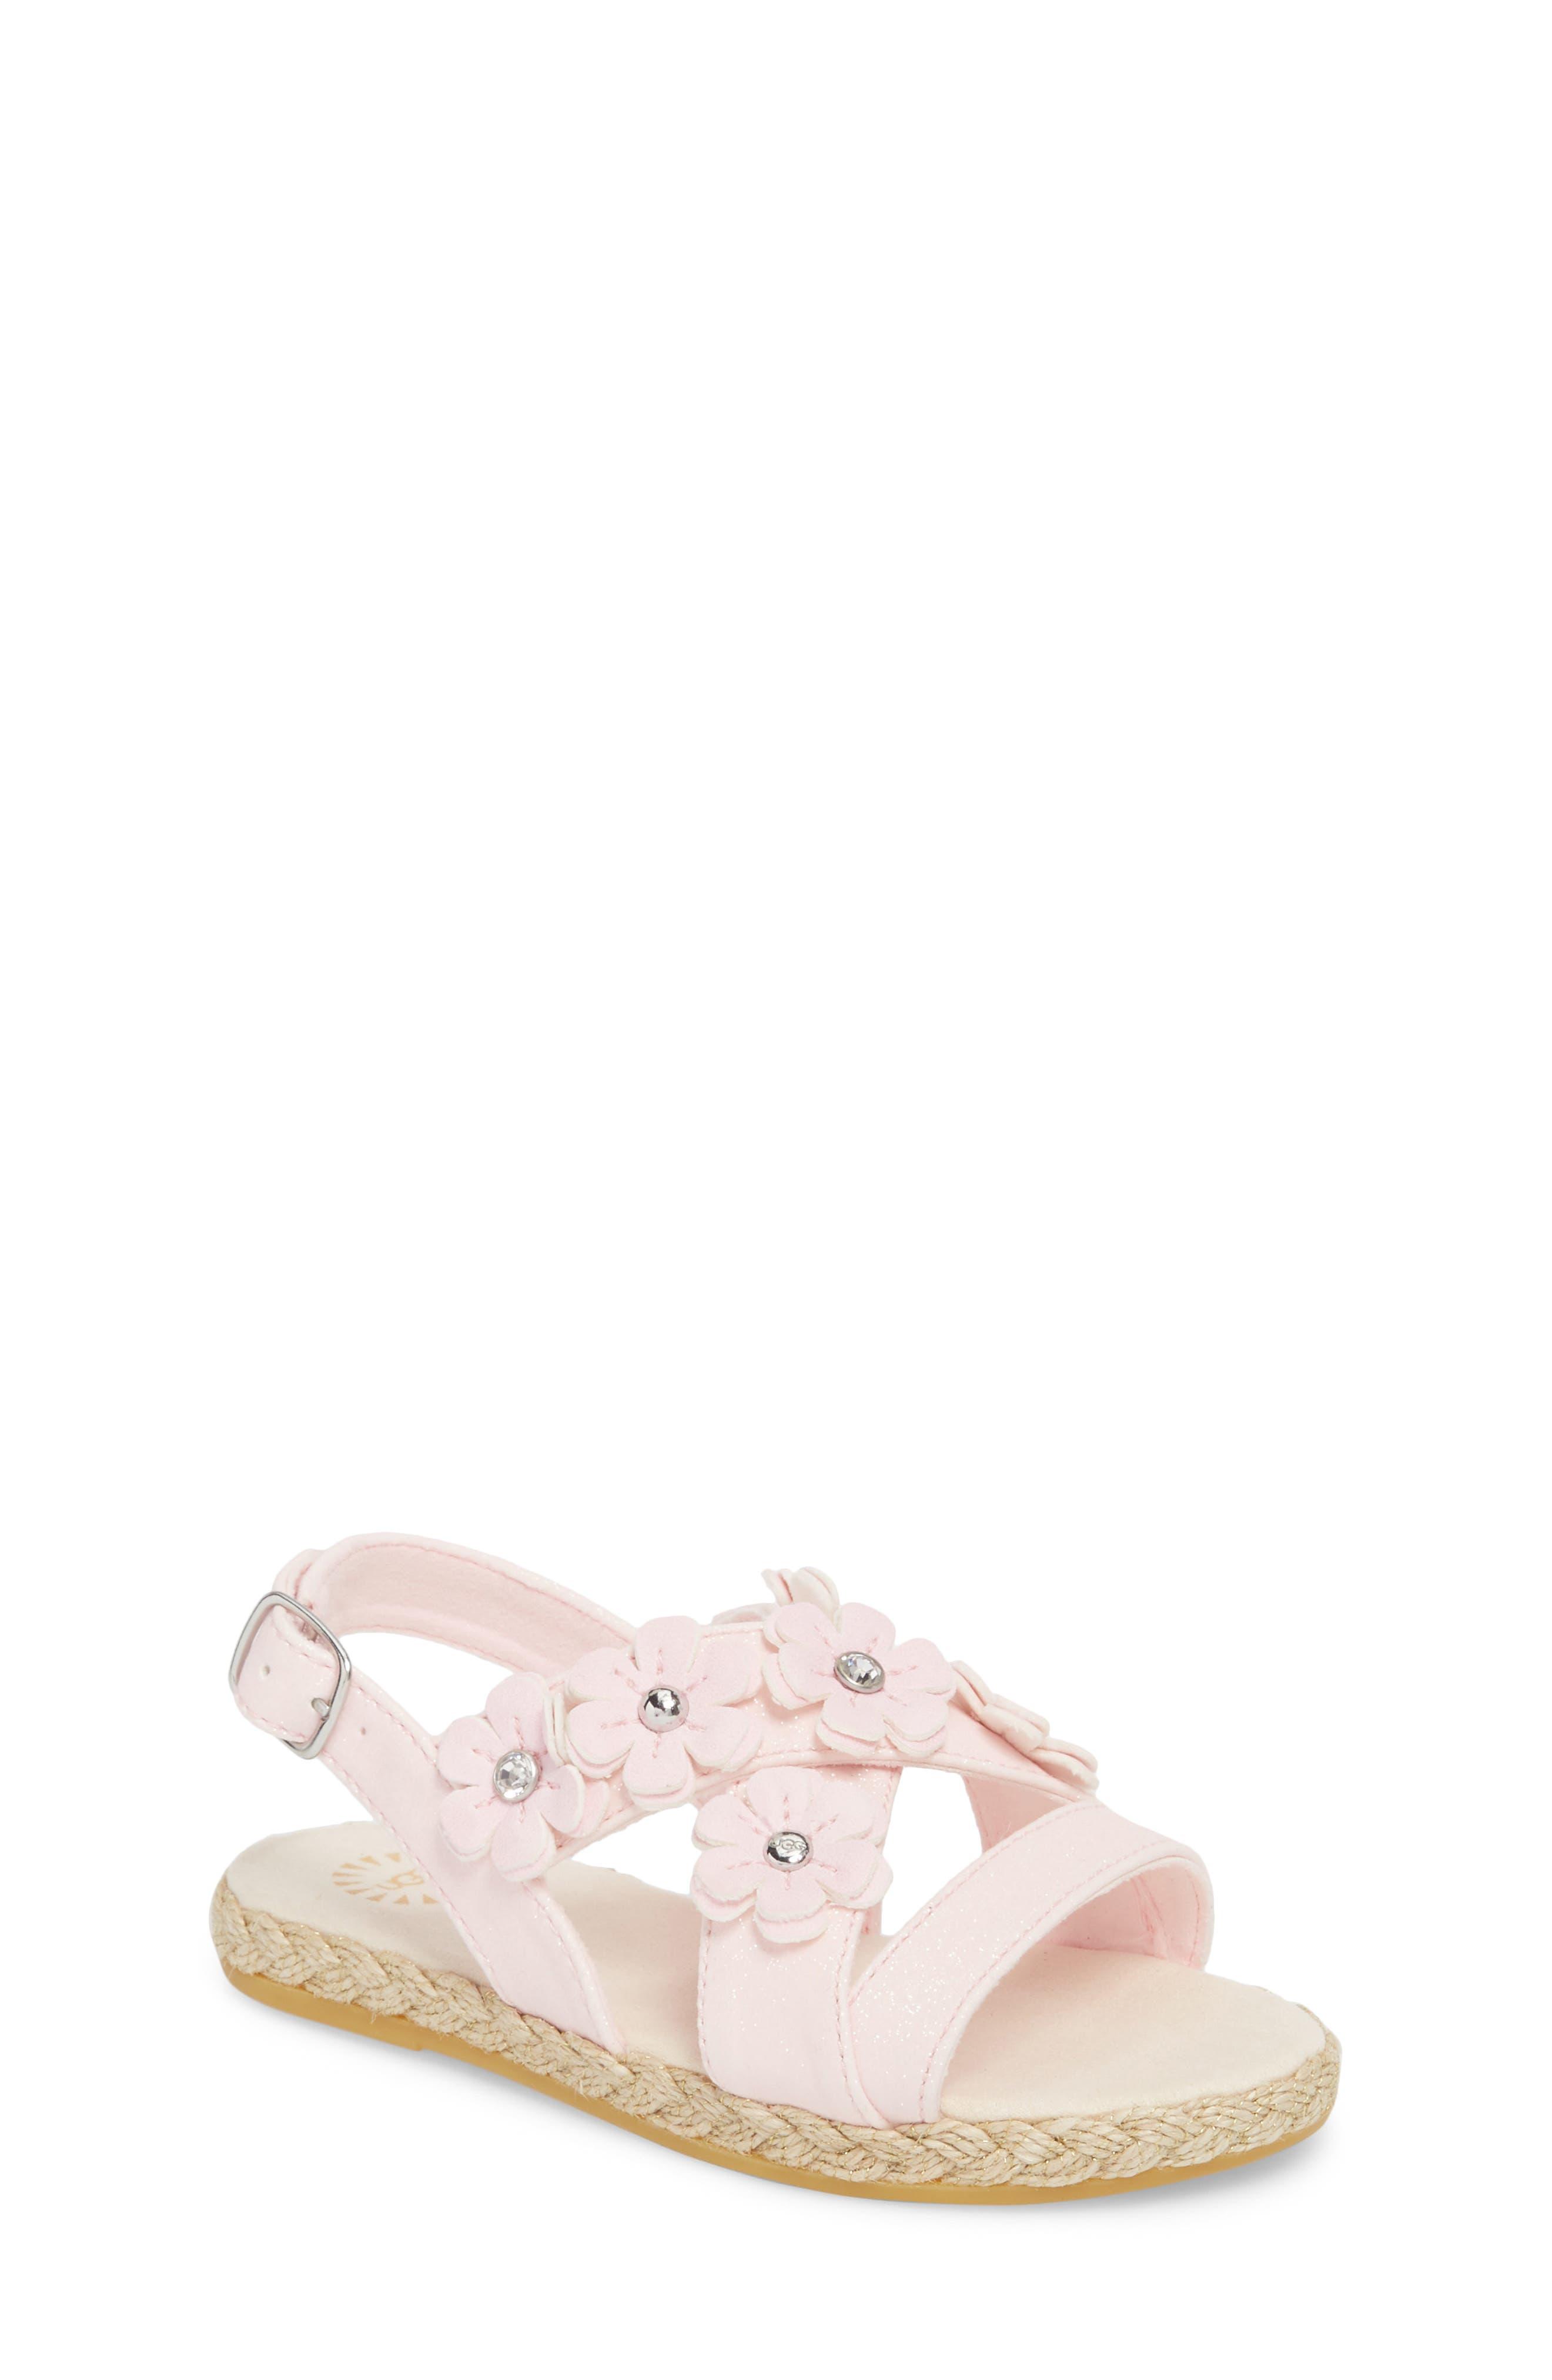 UGG<SUP>®</SUP>, Allairey Sparkles Espadrille Sandal, Main thumbnail 1, color, SEASHELL PINK